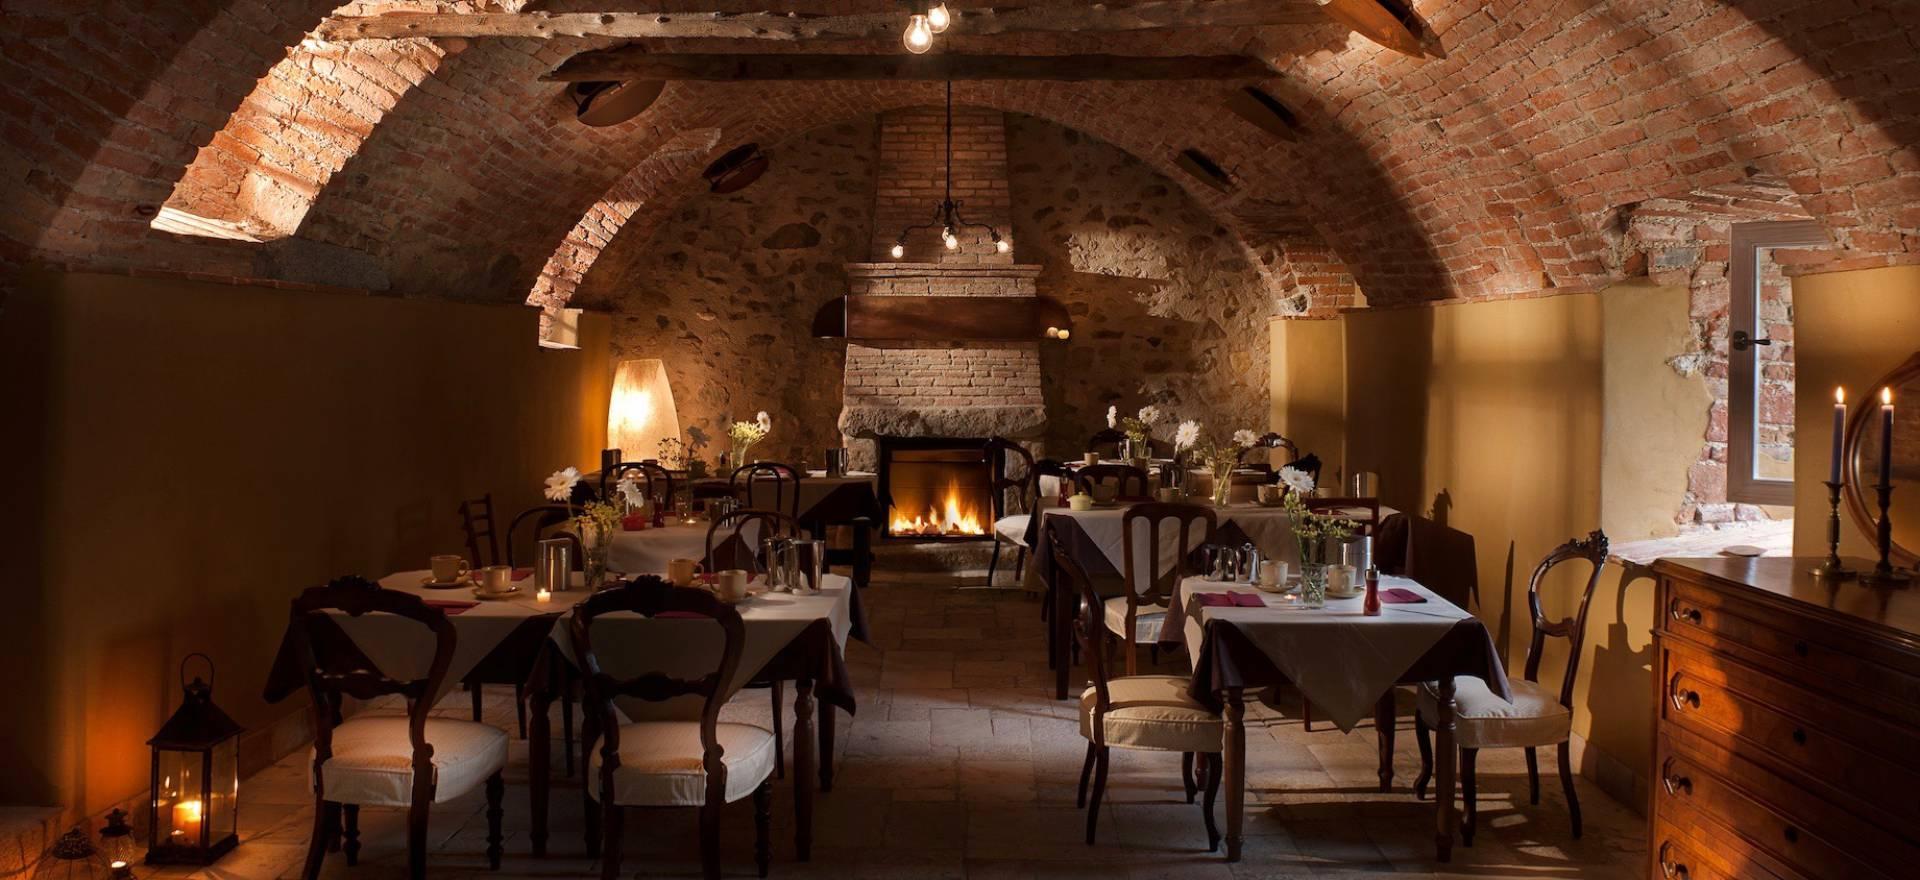 Agriturismo Lake Como and Lake Garda Country hotel Lake Garda, a luxurious oasis of peace